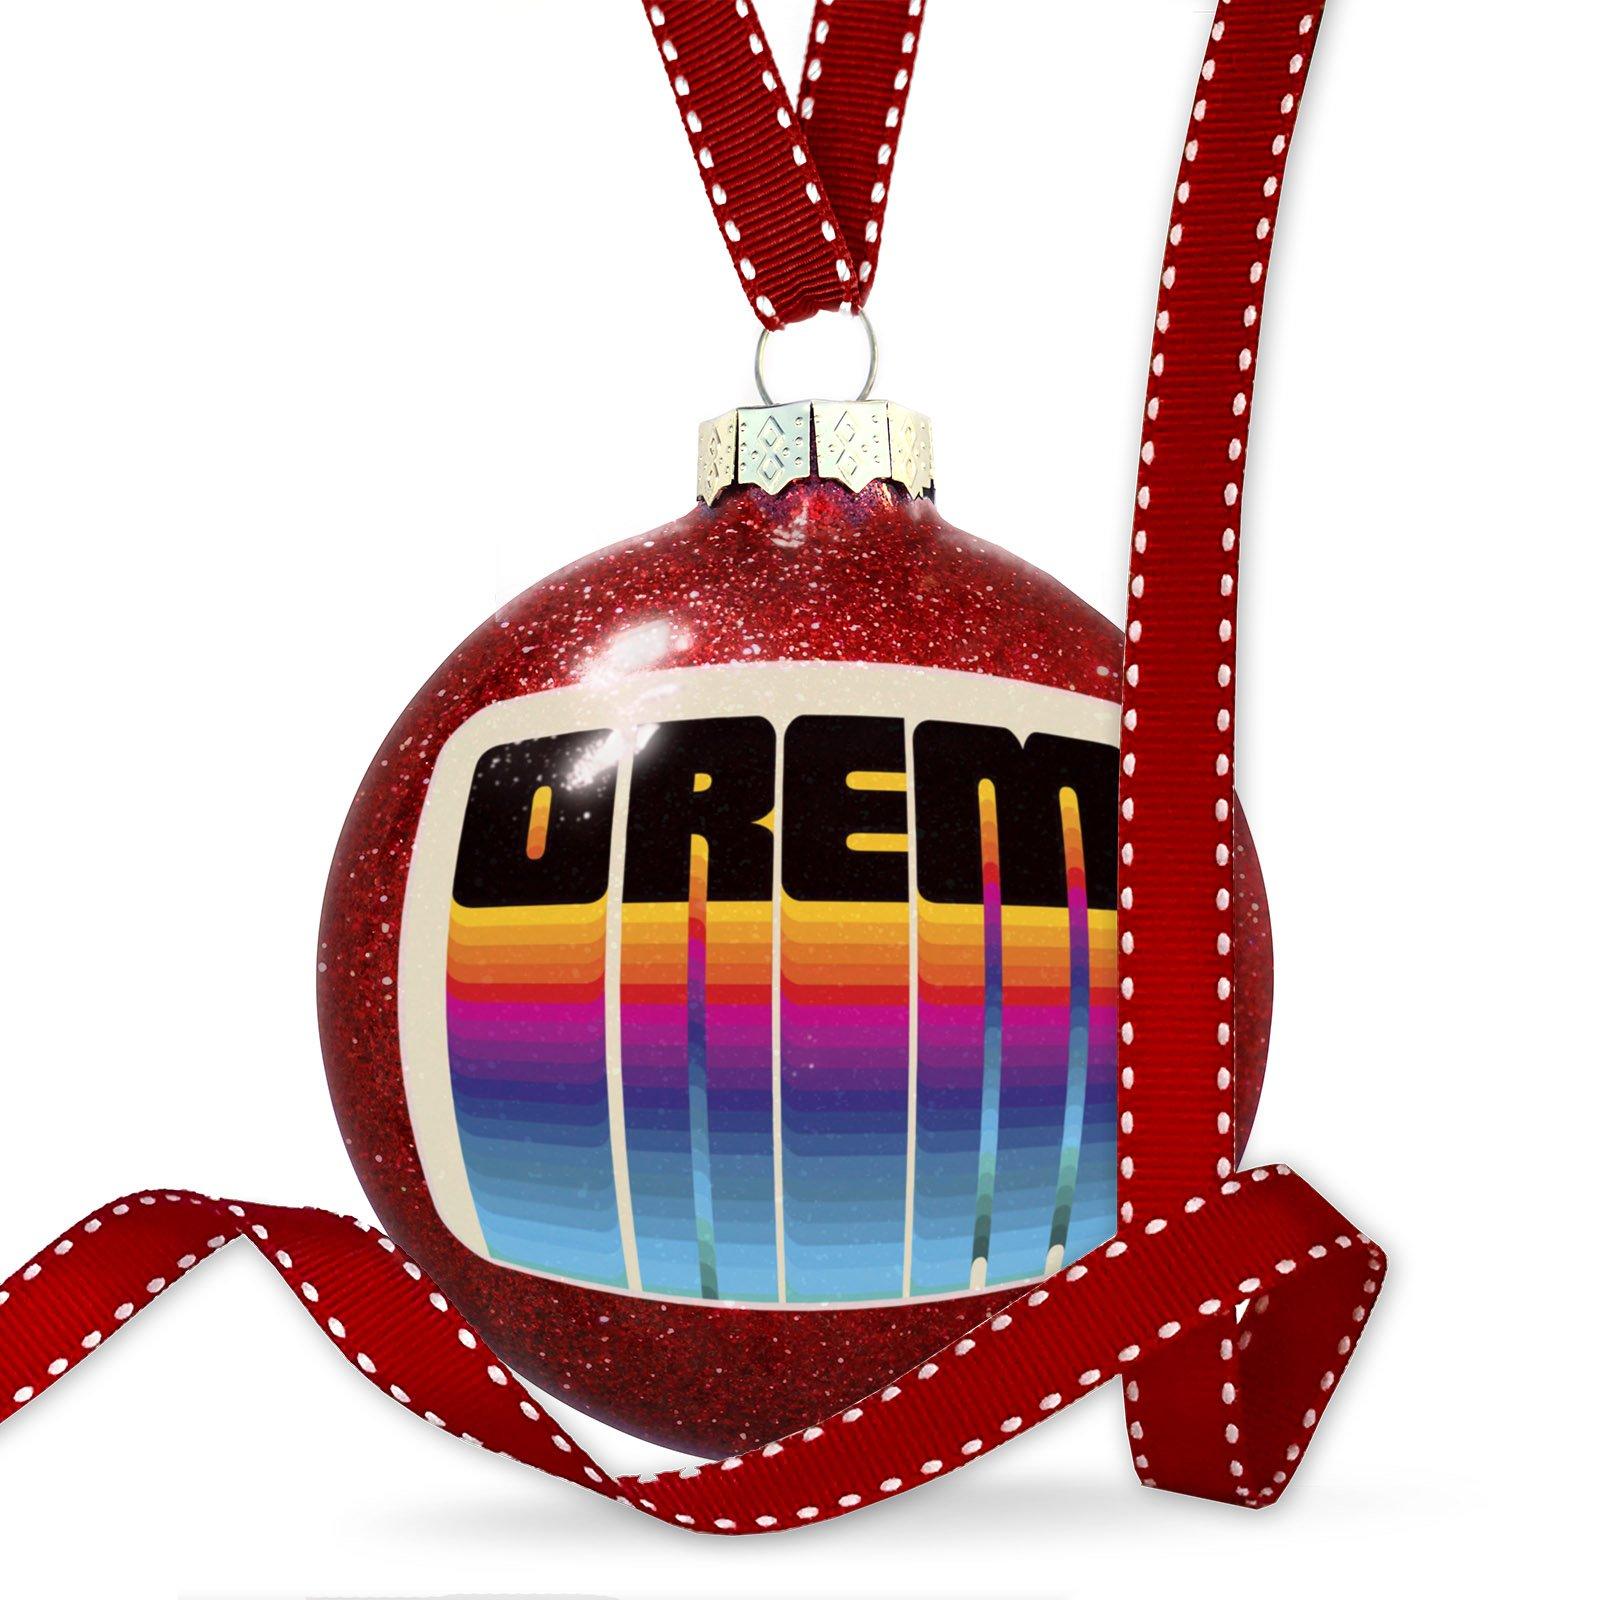 Christmas Decoration Retro Cites States Countries Orem Ornament by NEONBLOND (Image #1)